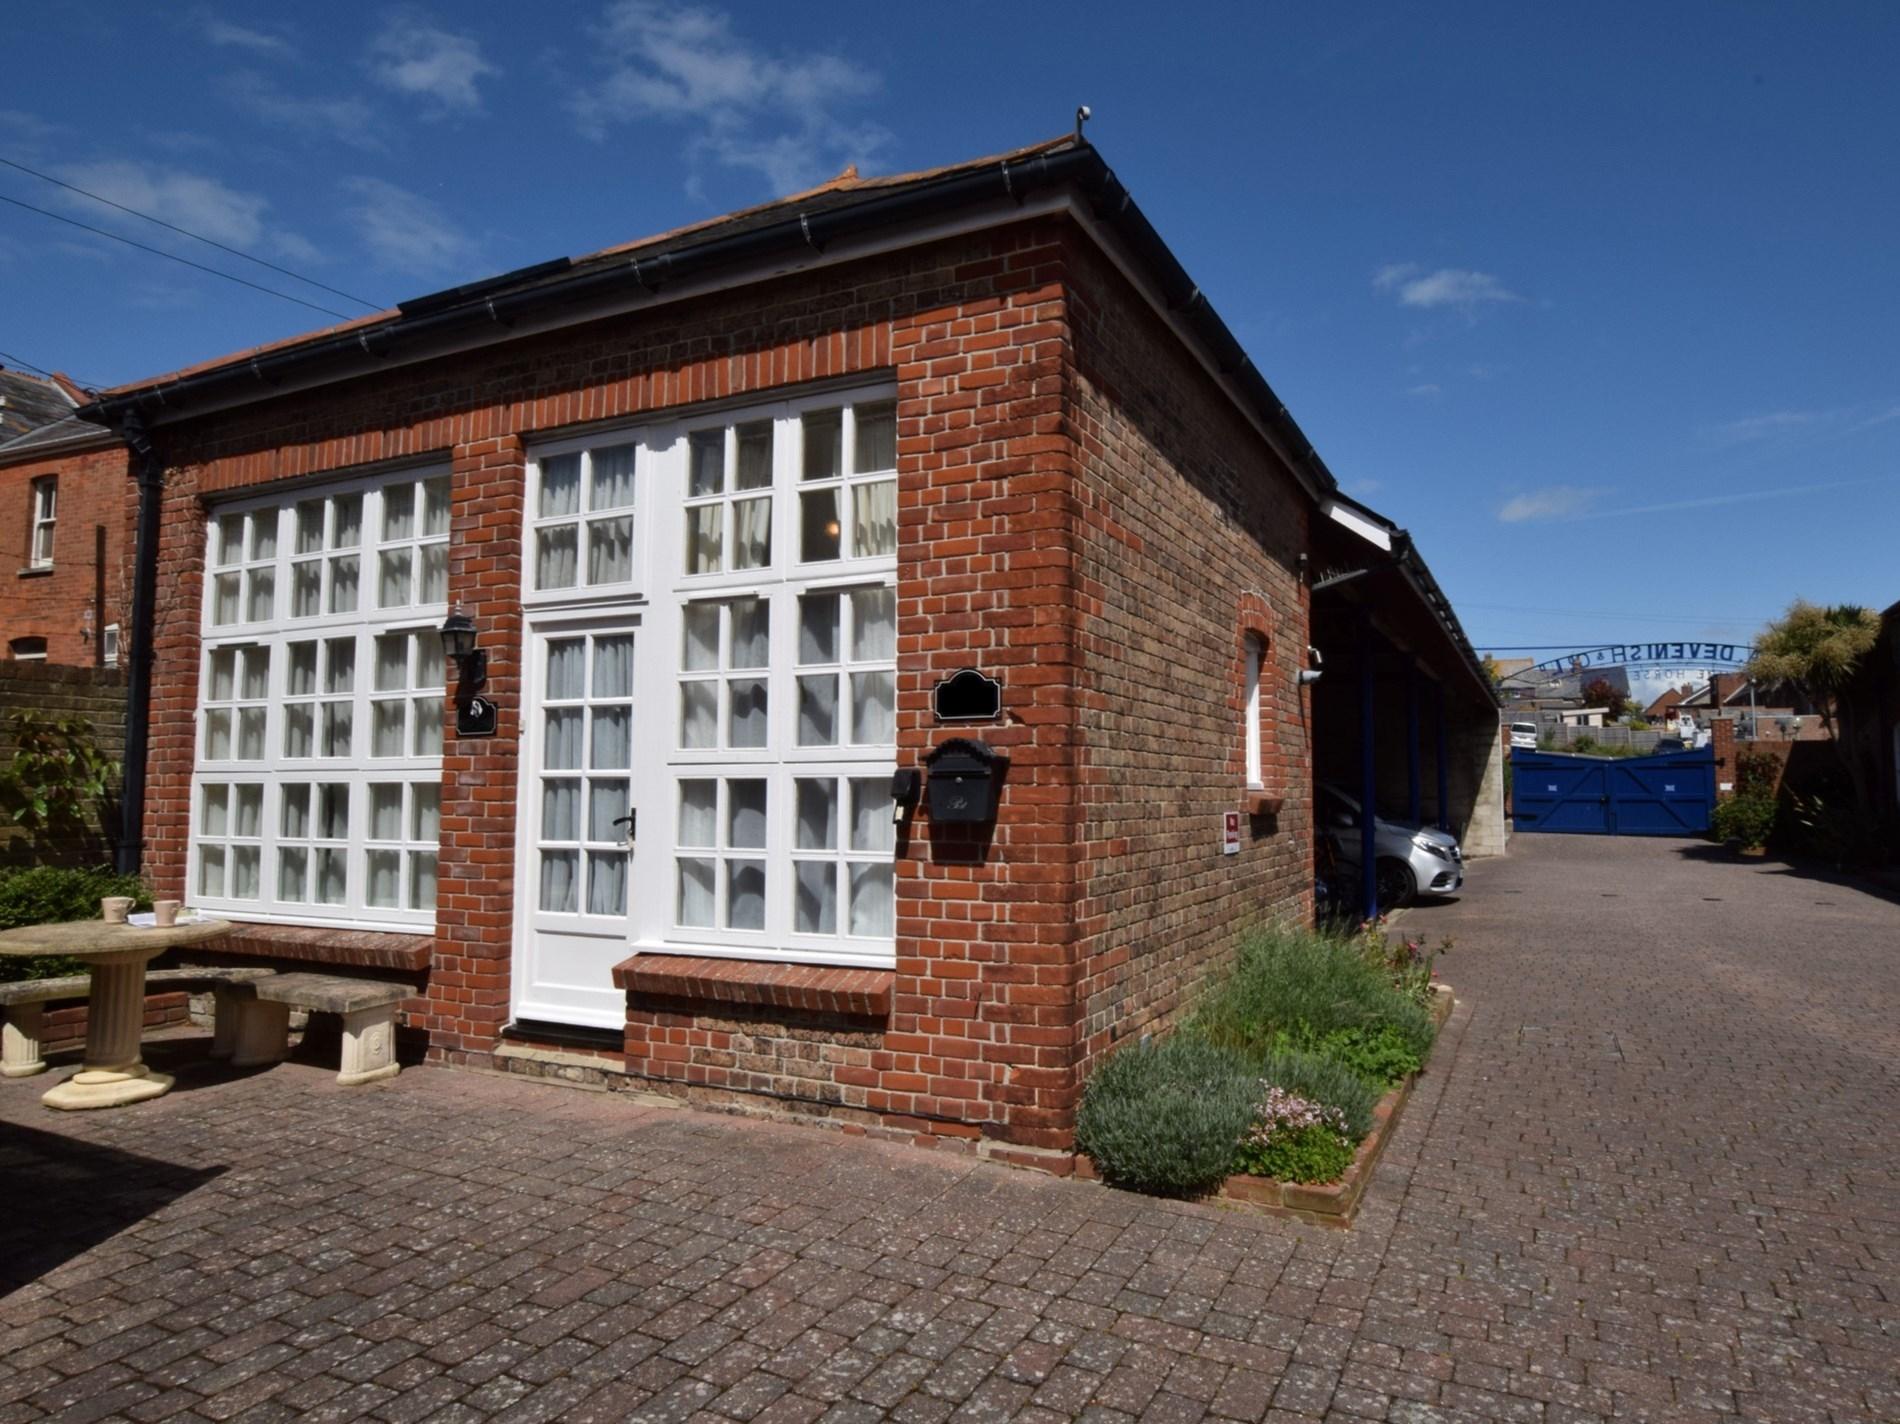 Ferienhaus in Weymouth